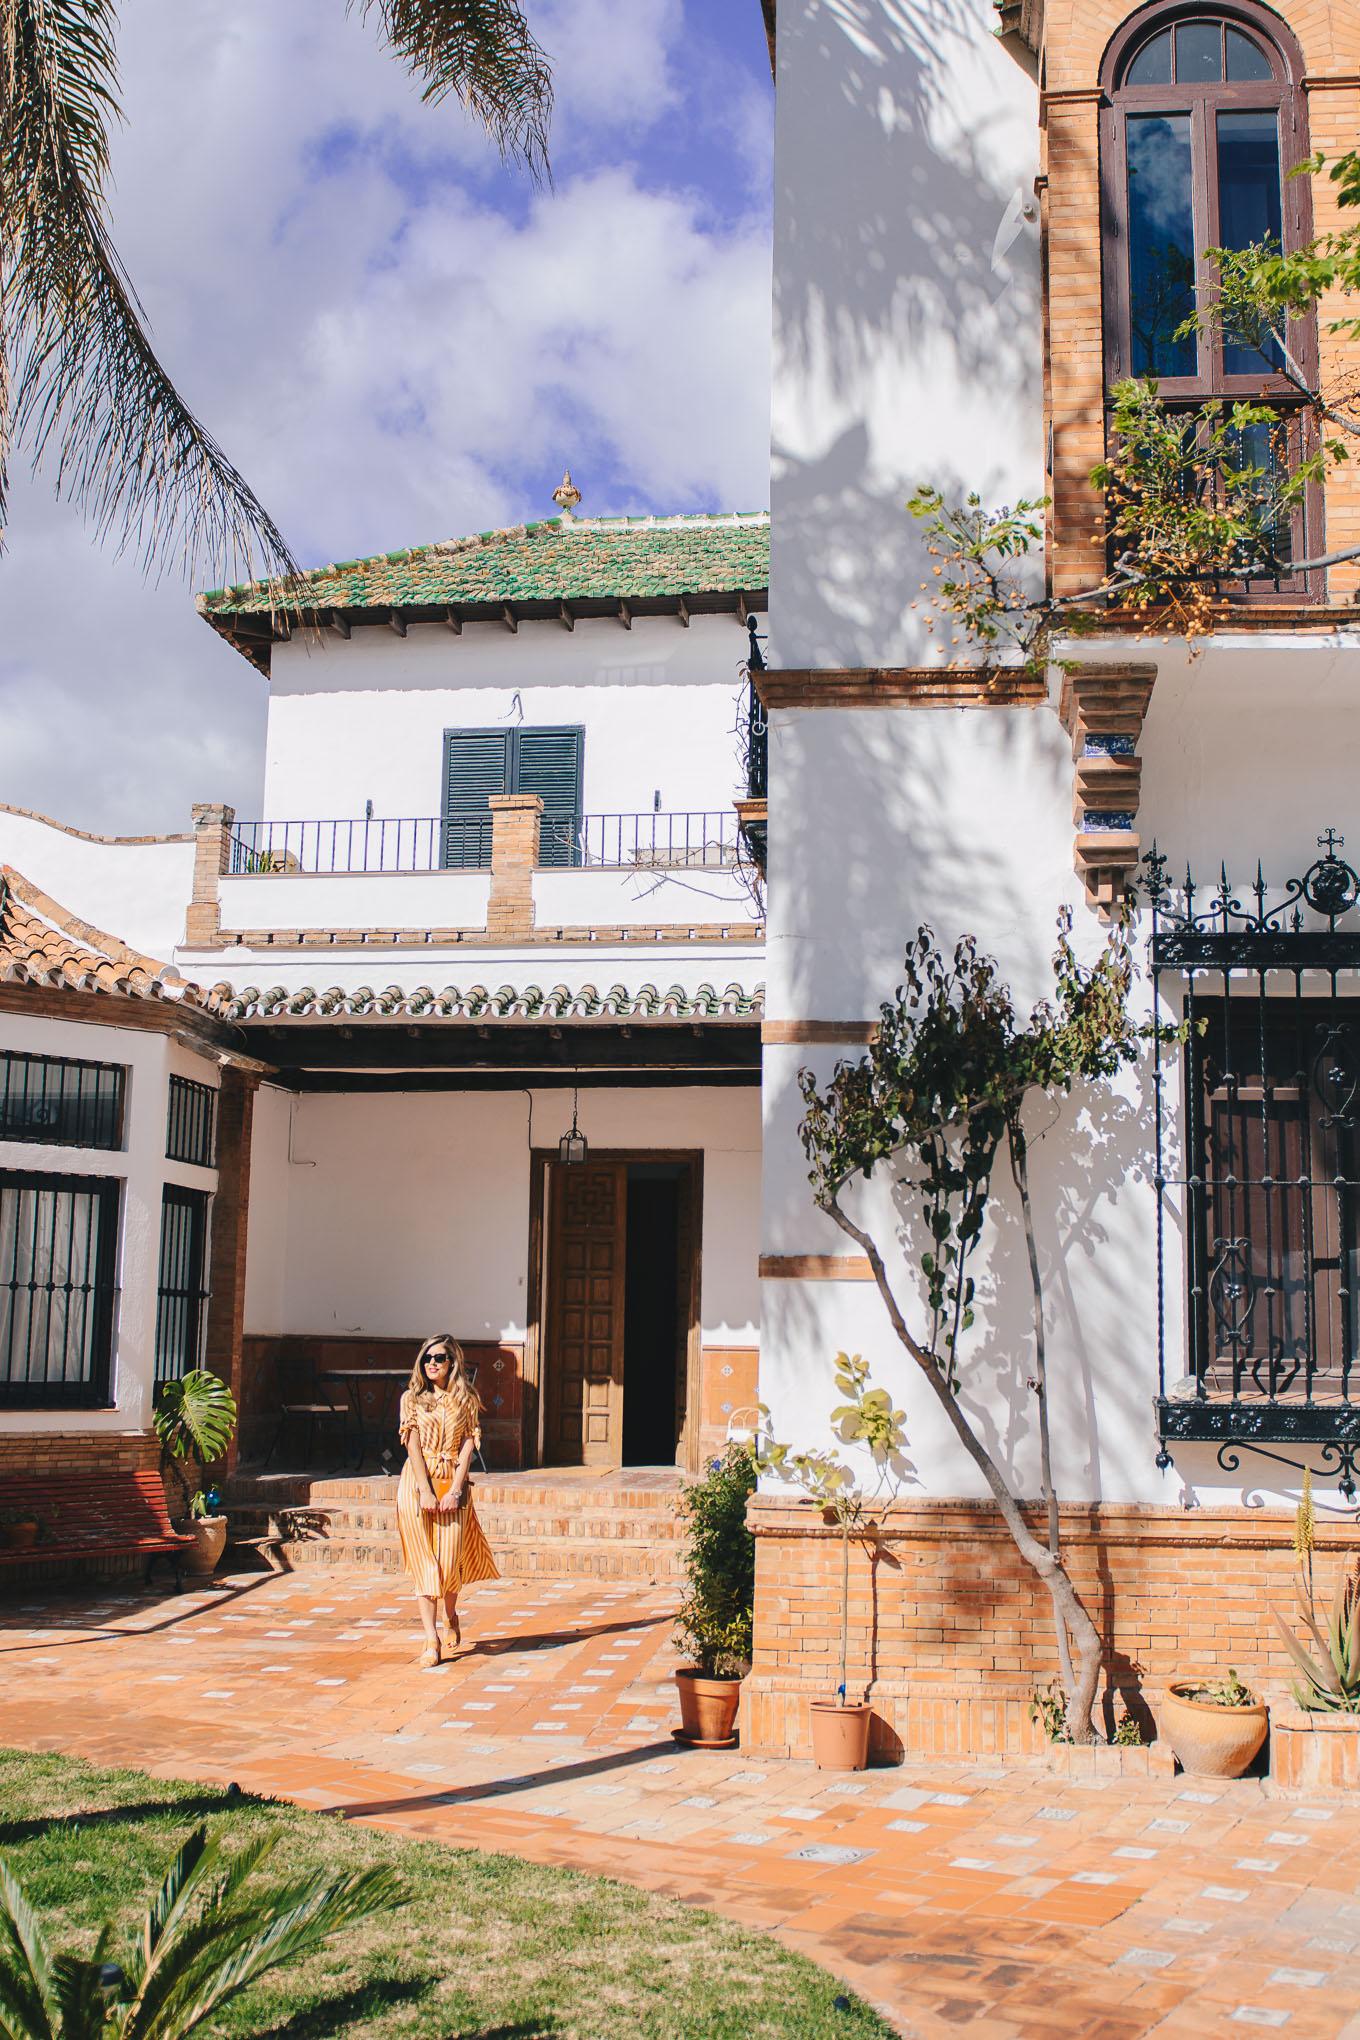 Sunny villa Elisa Malaga